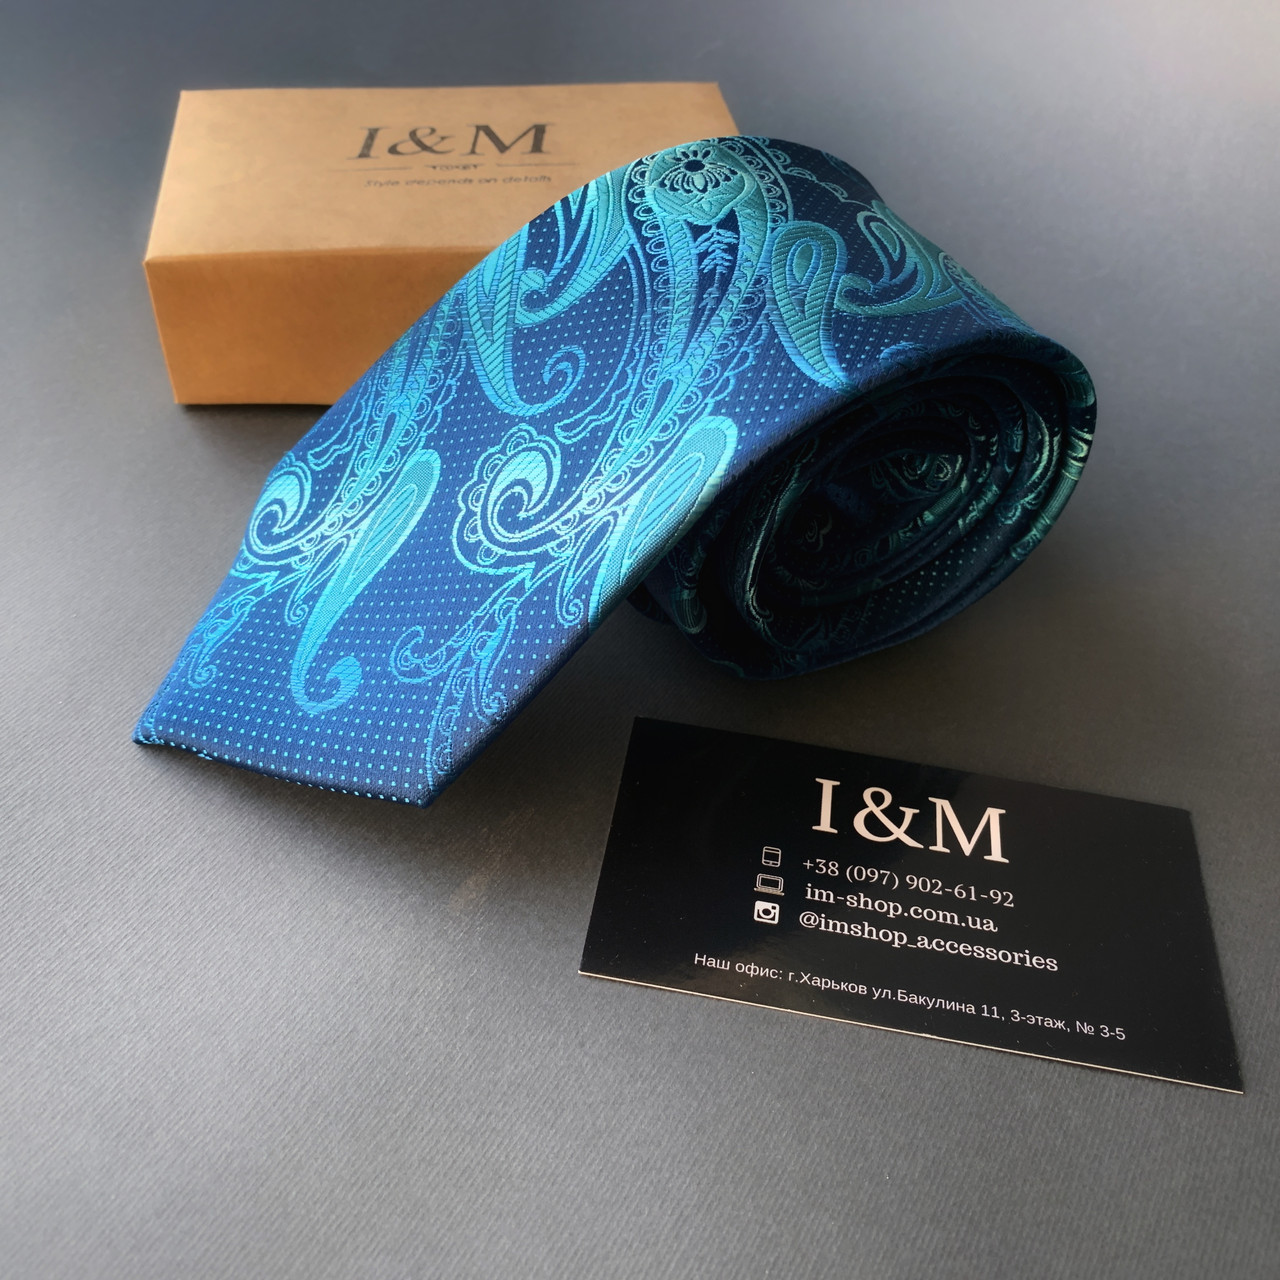 Галстук I&M Craft синий с узорами (020328)